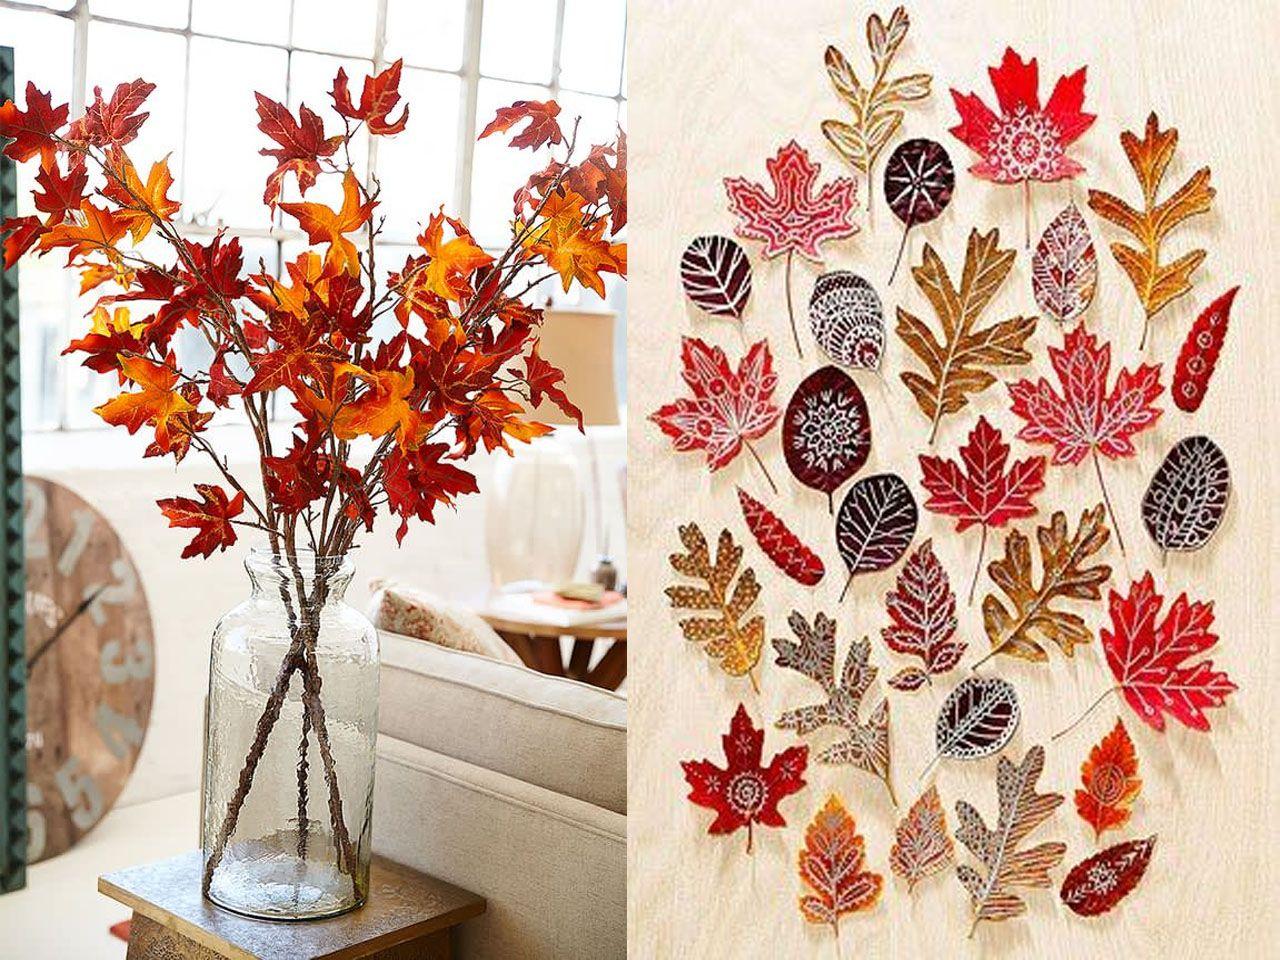 7 encantadoras ideas de decoraci n de oto o para tu hogar decoraci n con plantas pinterest Decoracion otono